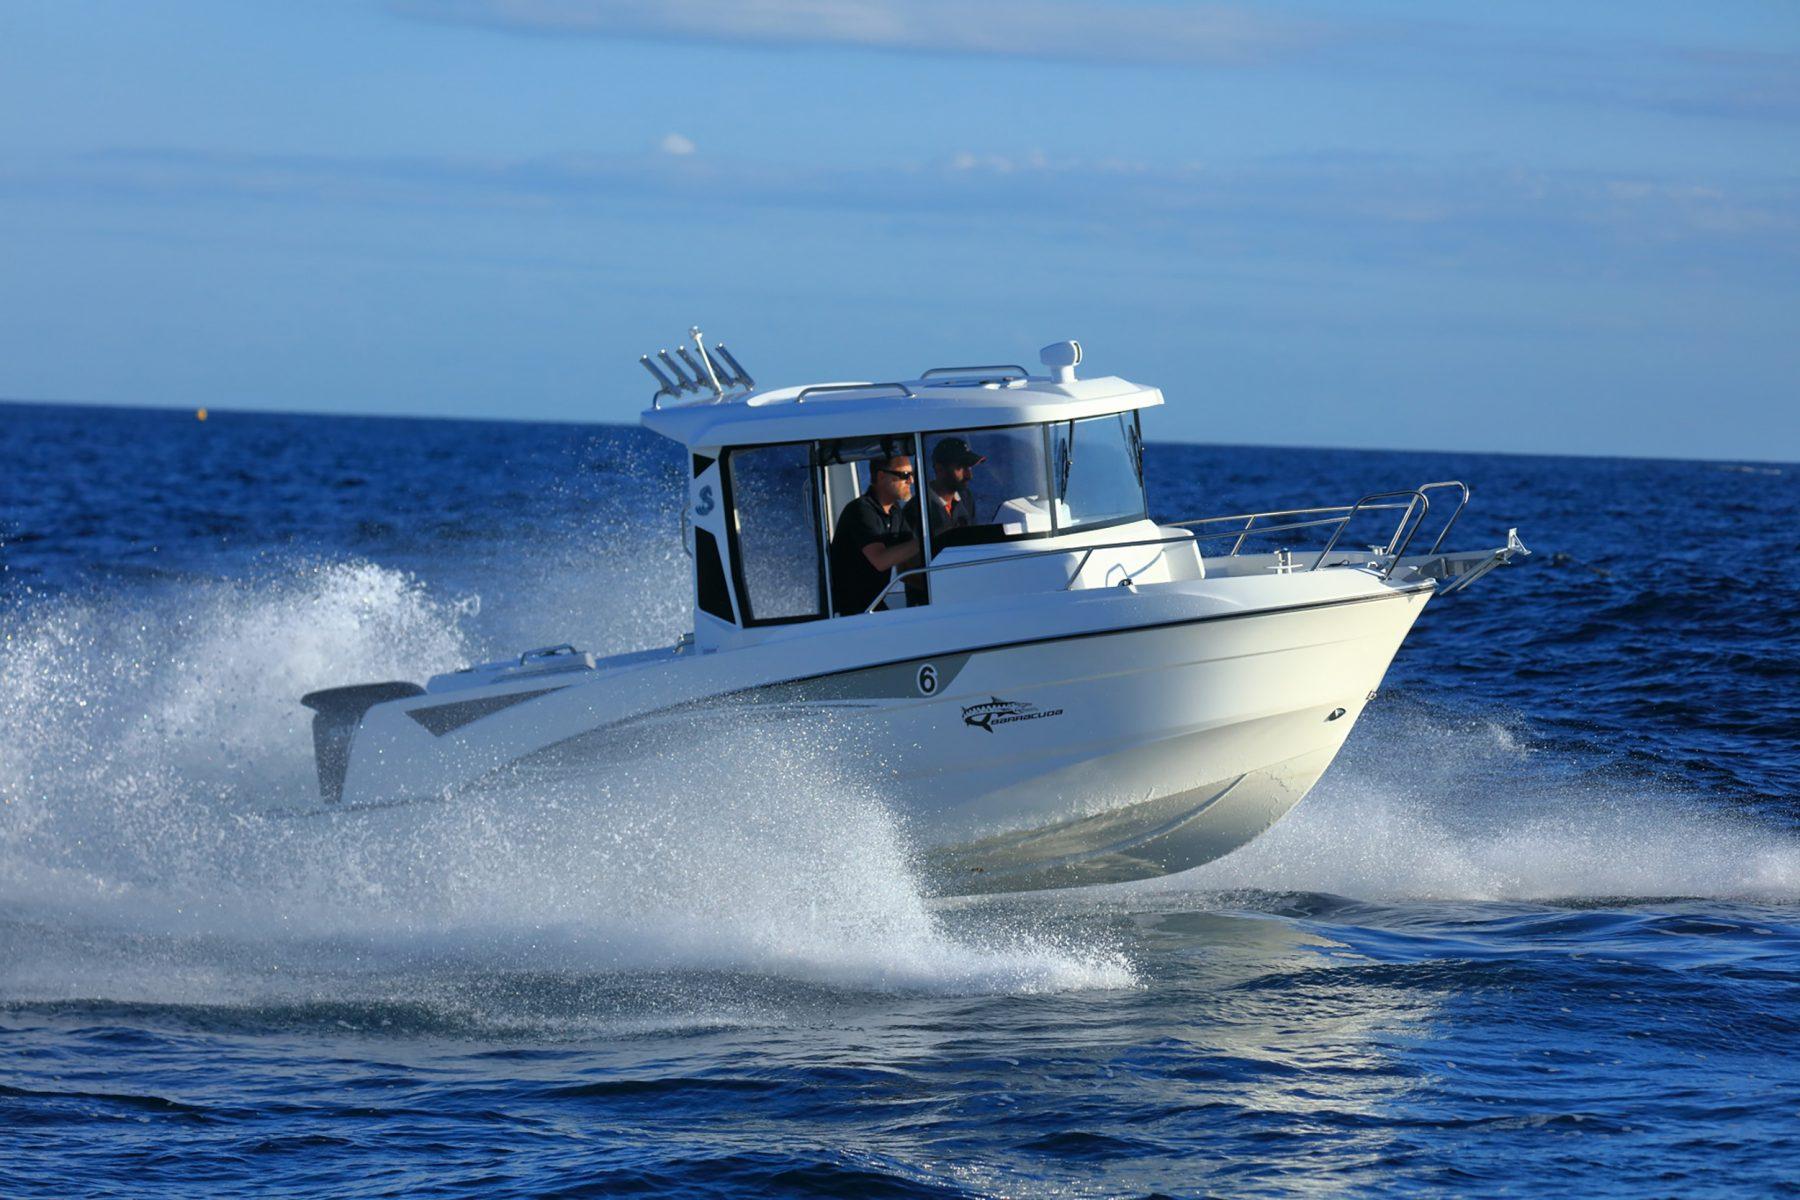 Simpson Marine - 巴拉可达6